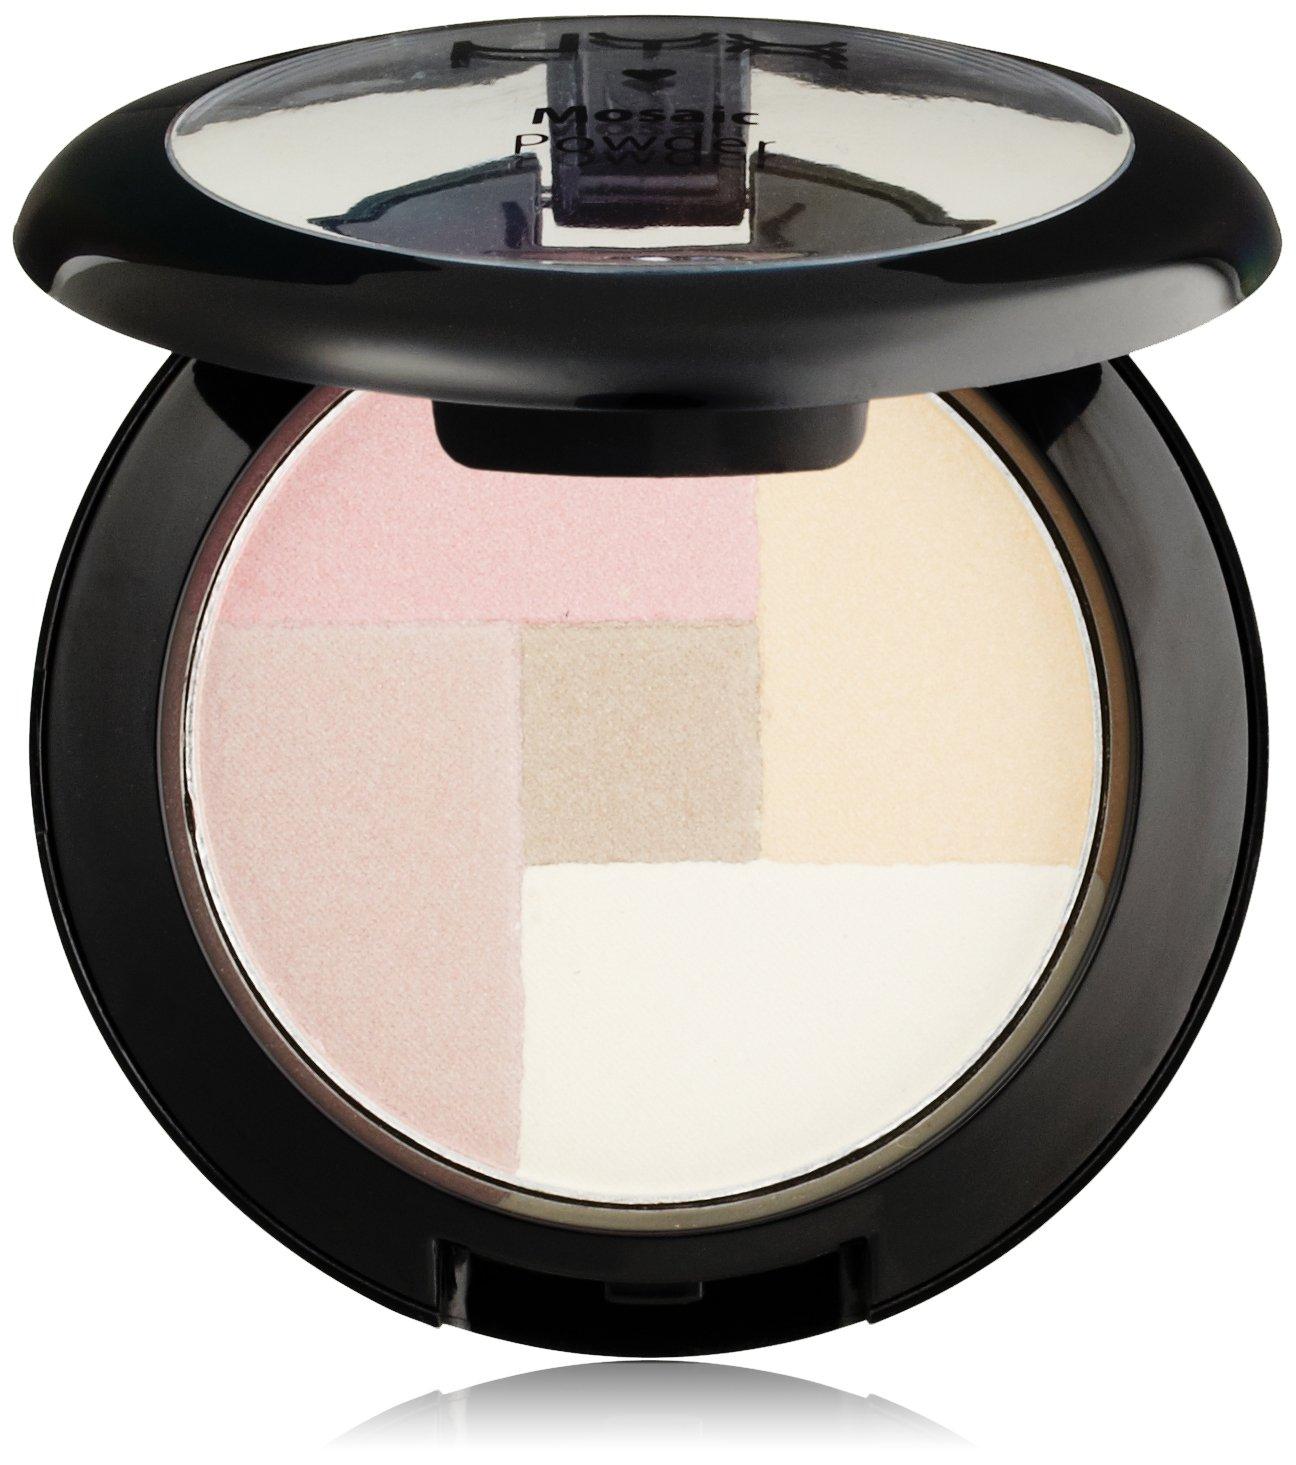 NYX Cosmetics, Palette di cipria iluminante a mosaico, Plummy NYX Cosmetics USA Inc. NYX-MPB03